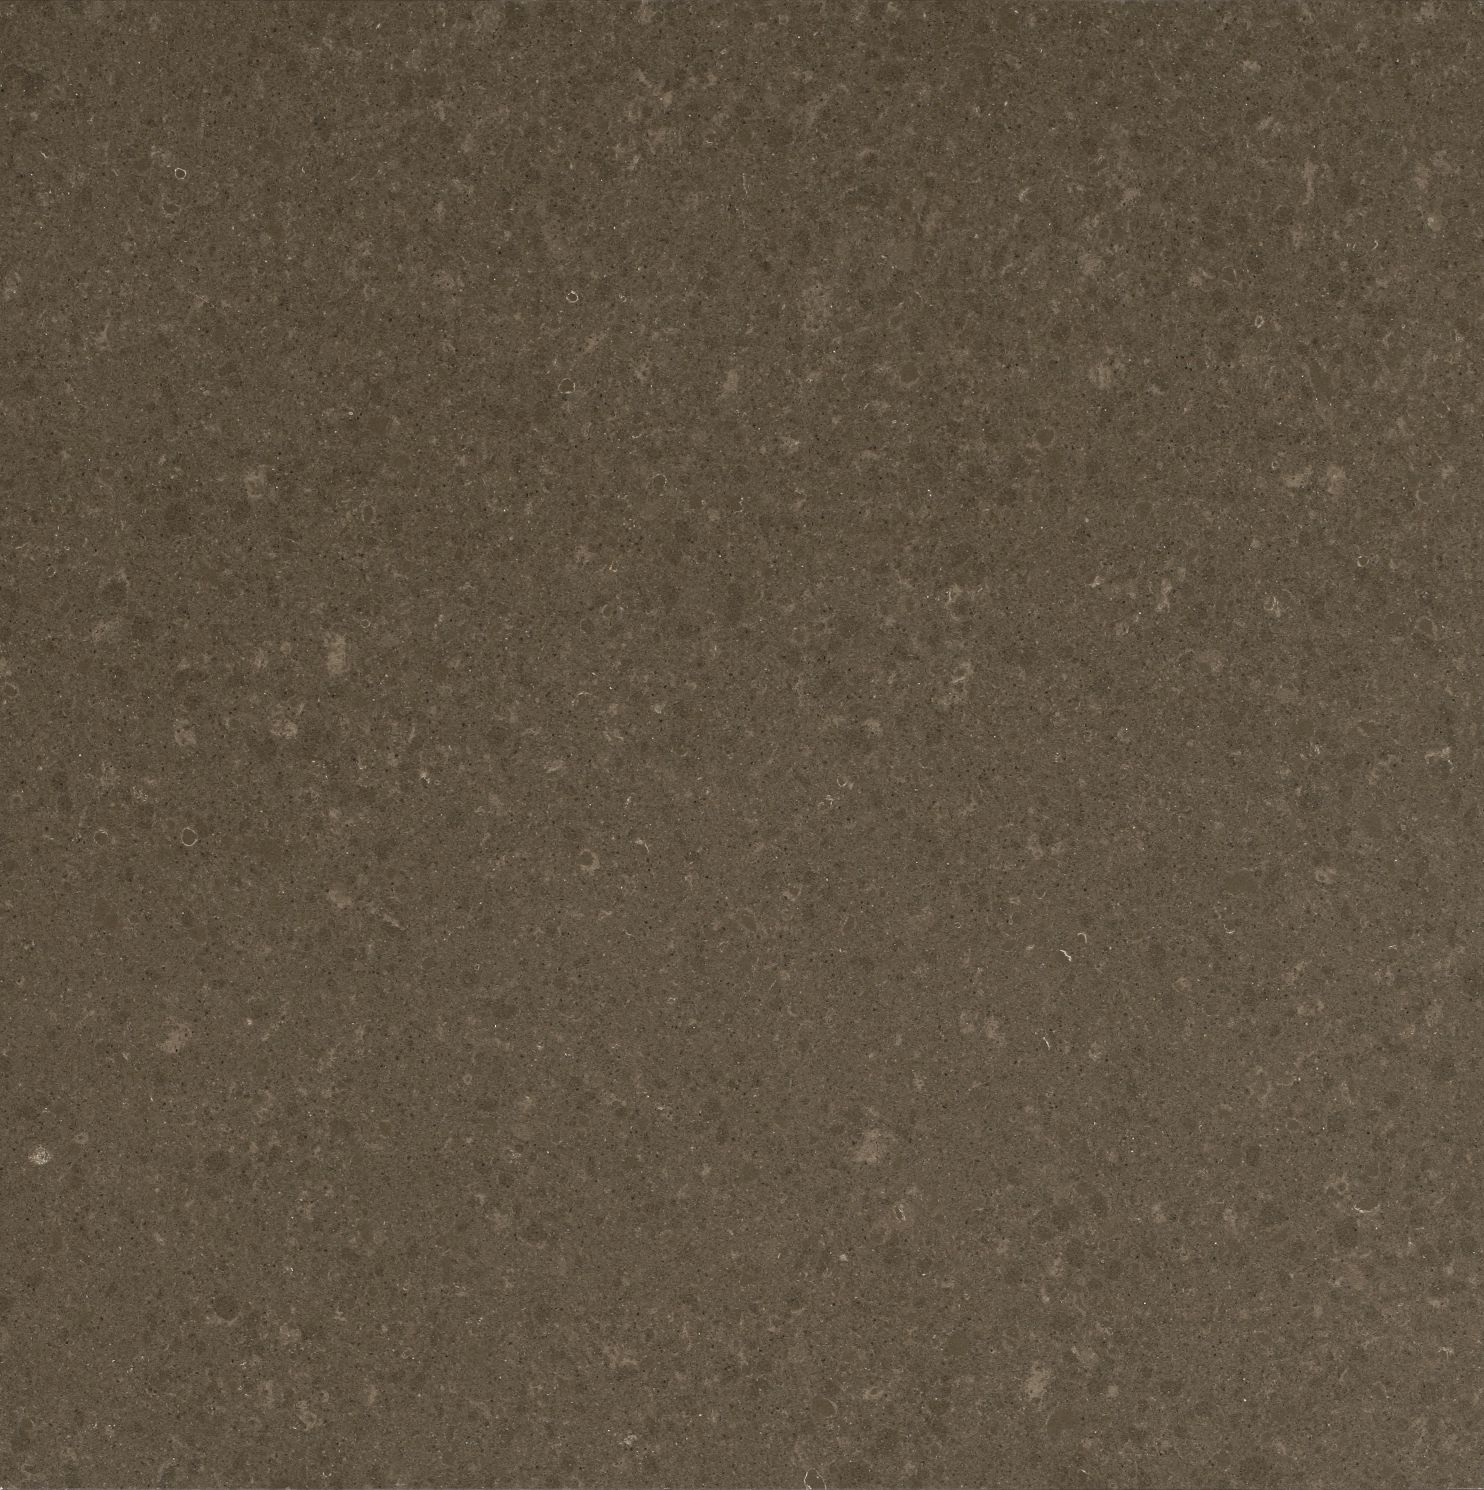 שיש אבן קיסר דגם 4360